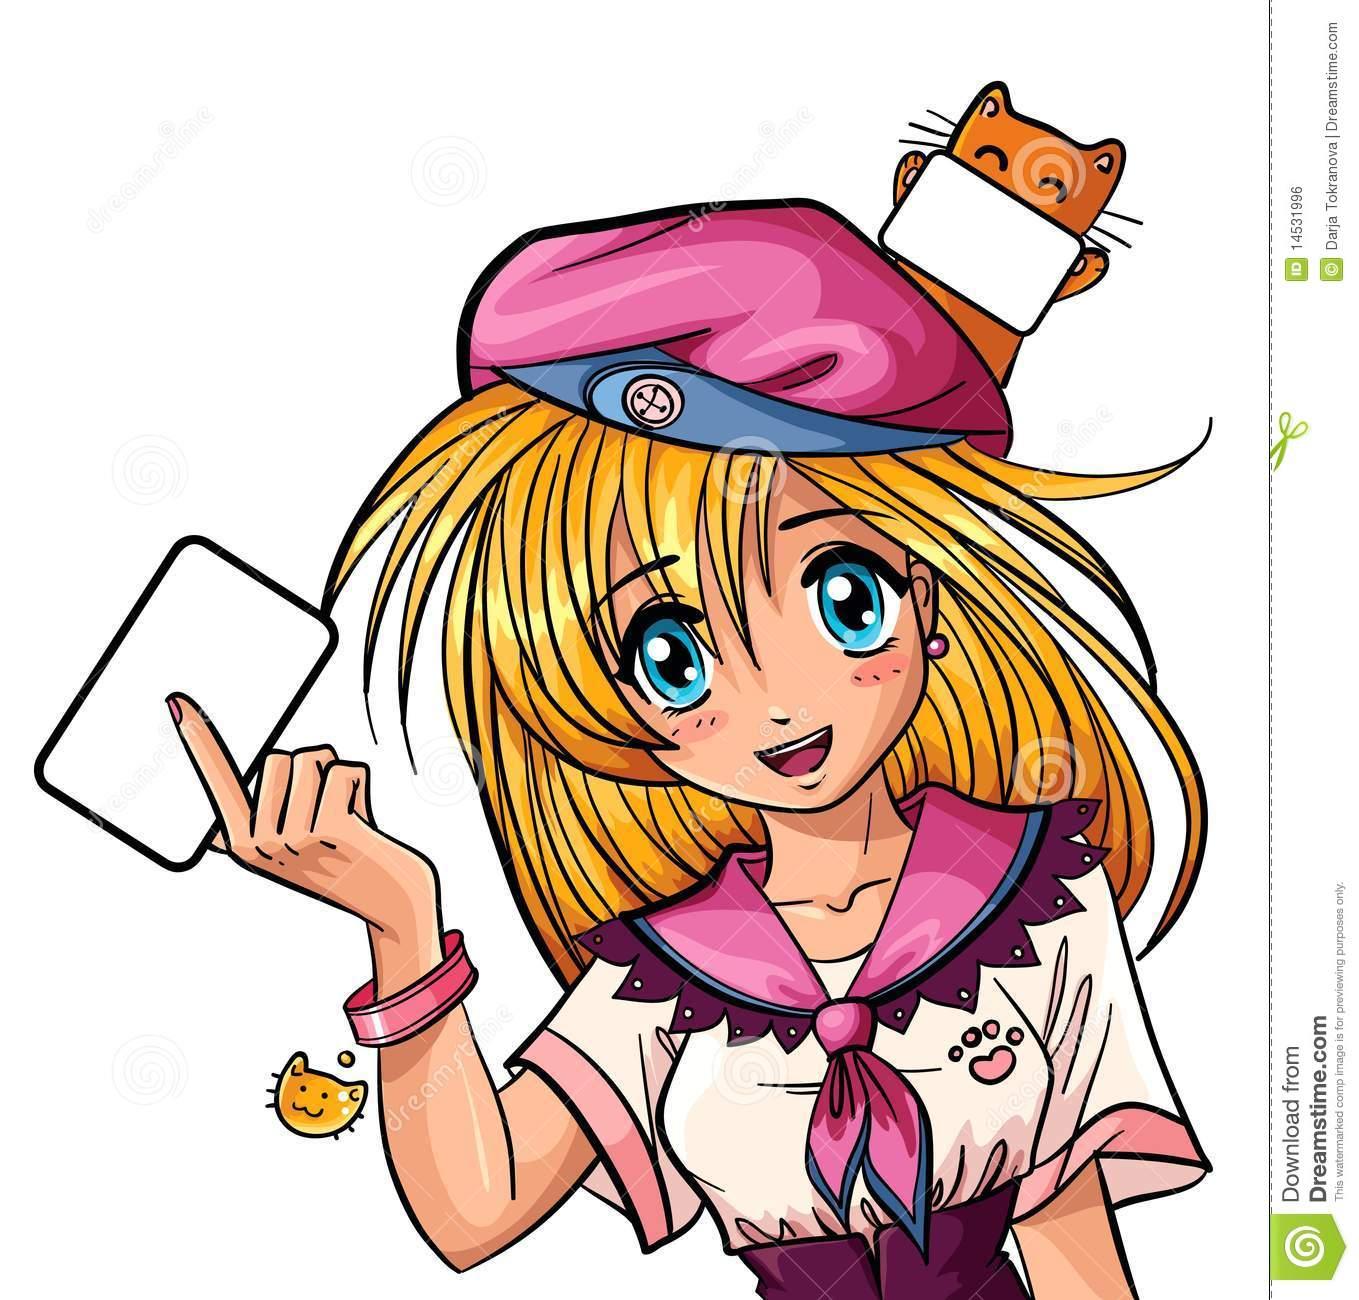 Manga girl clipart image library stock Manga Stock Illustrations – 10,162 Manga Stock Illustrations ... image library stock